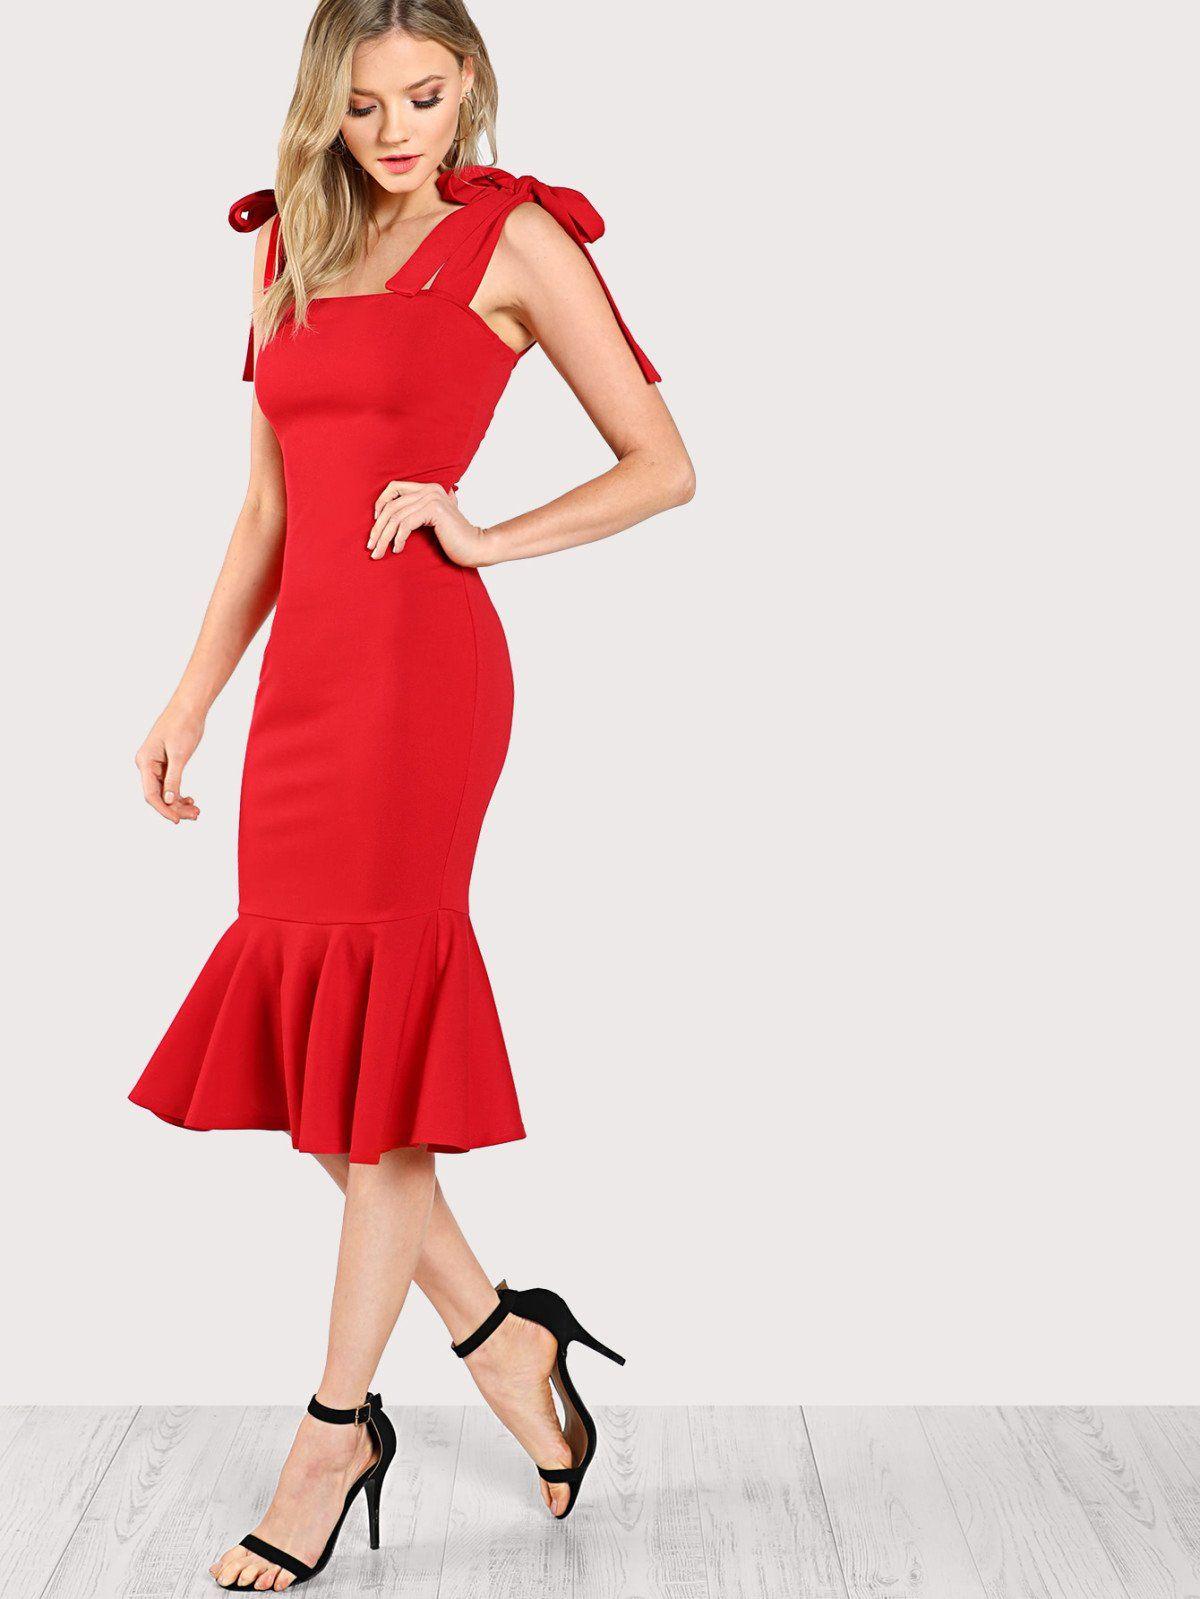 Sleeveless dresses long dresses decorated with ruffle ruffle hem